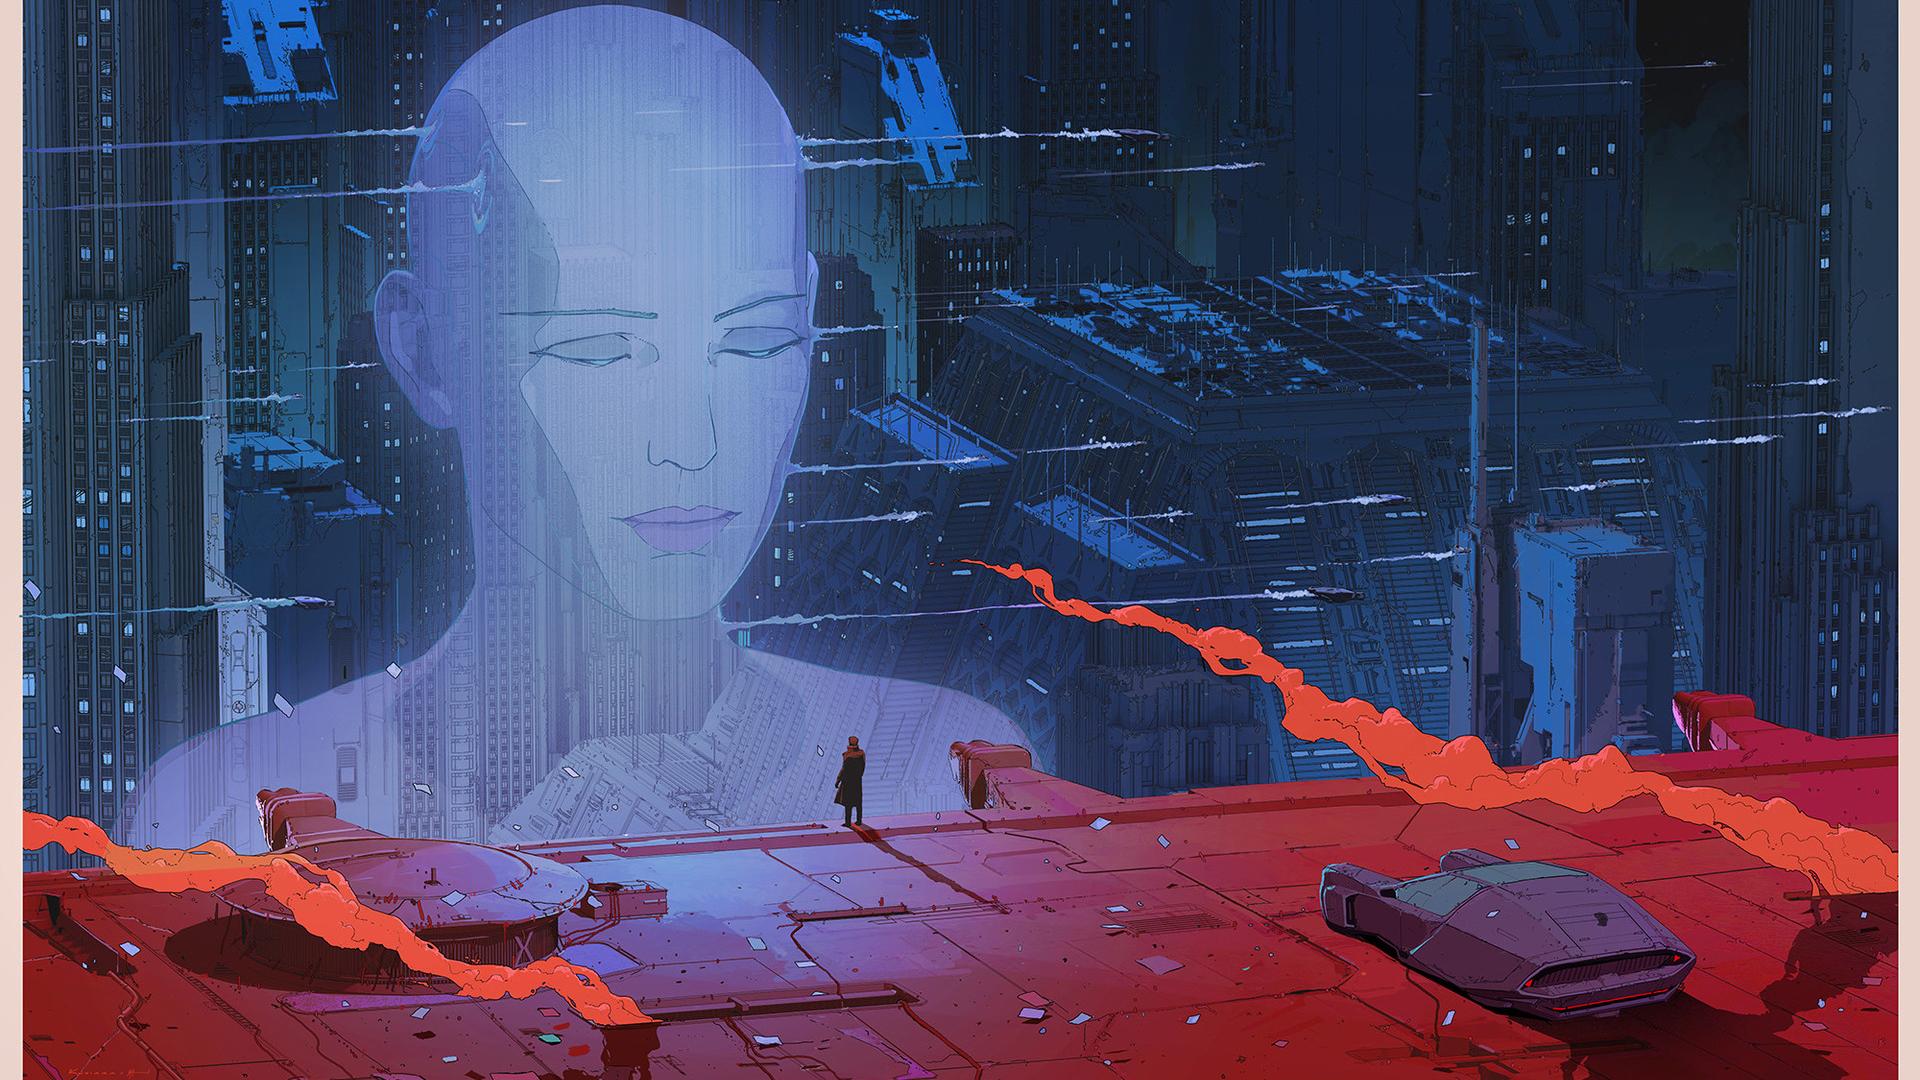 Wallpaper 1920x1080 Px Blade Runner Blade Runner 2049